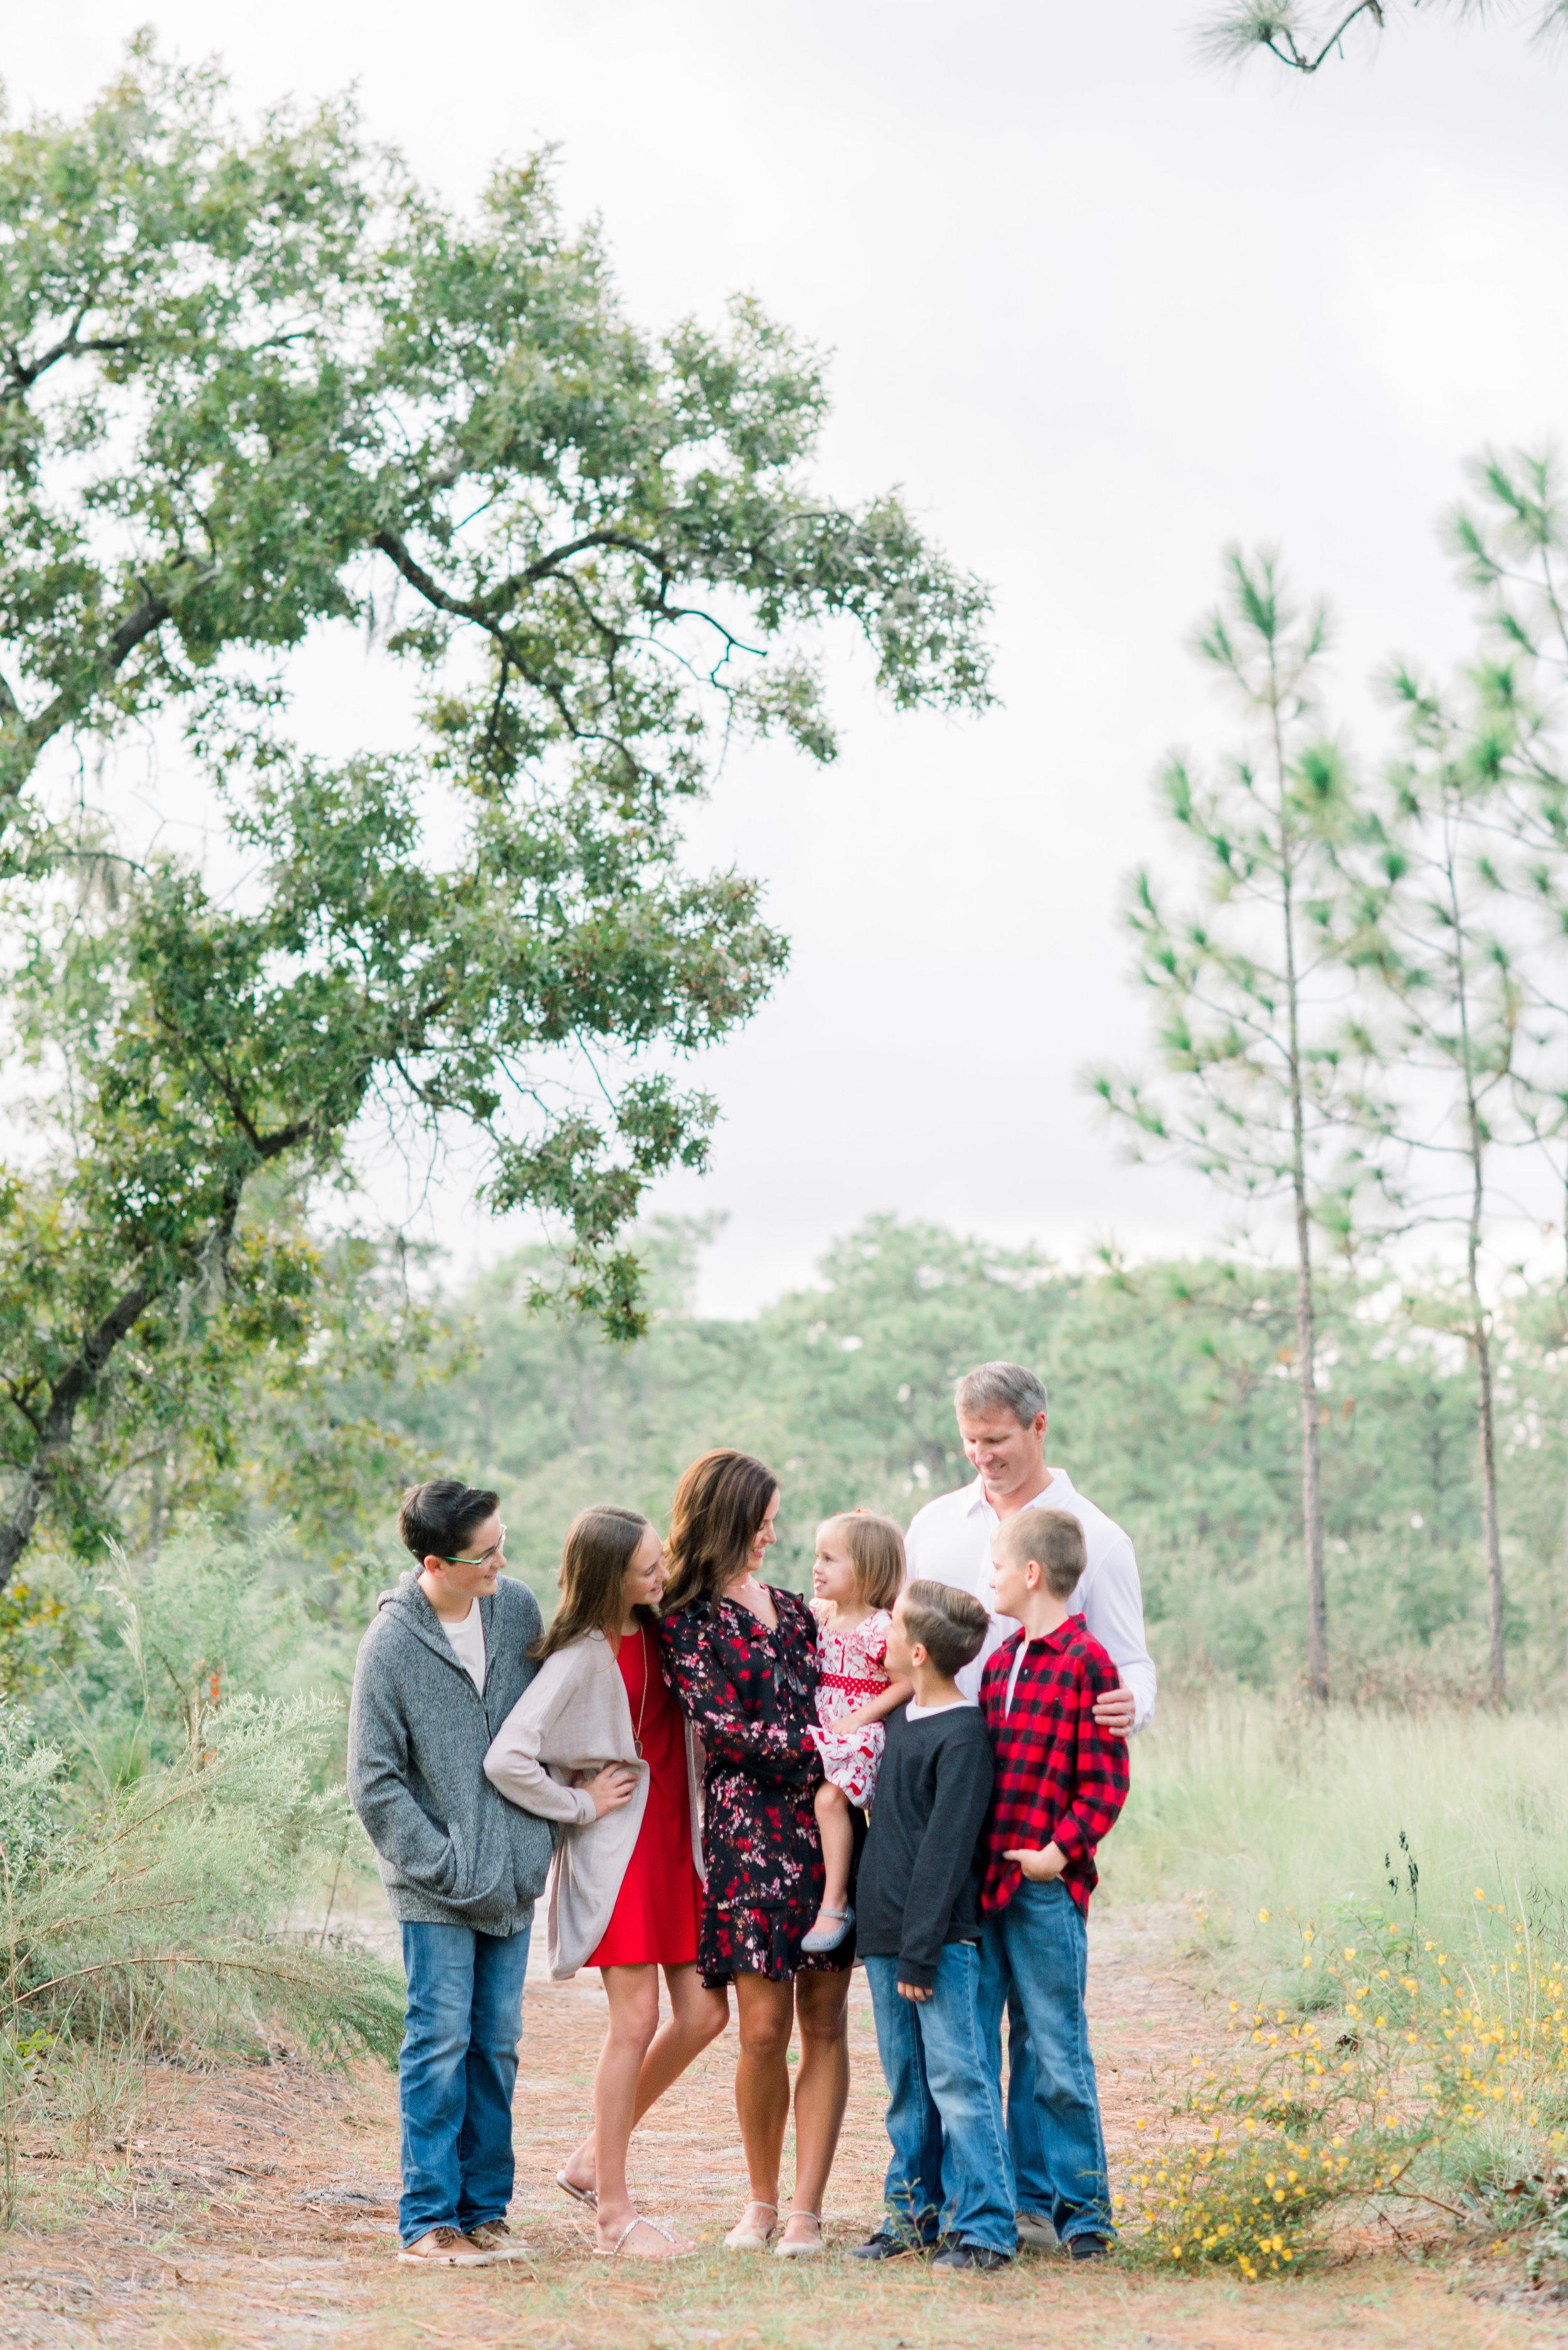 KateTaramykinStudios-Wekiva-Springs-Family-Photographer-Donald-12.jpg